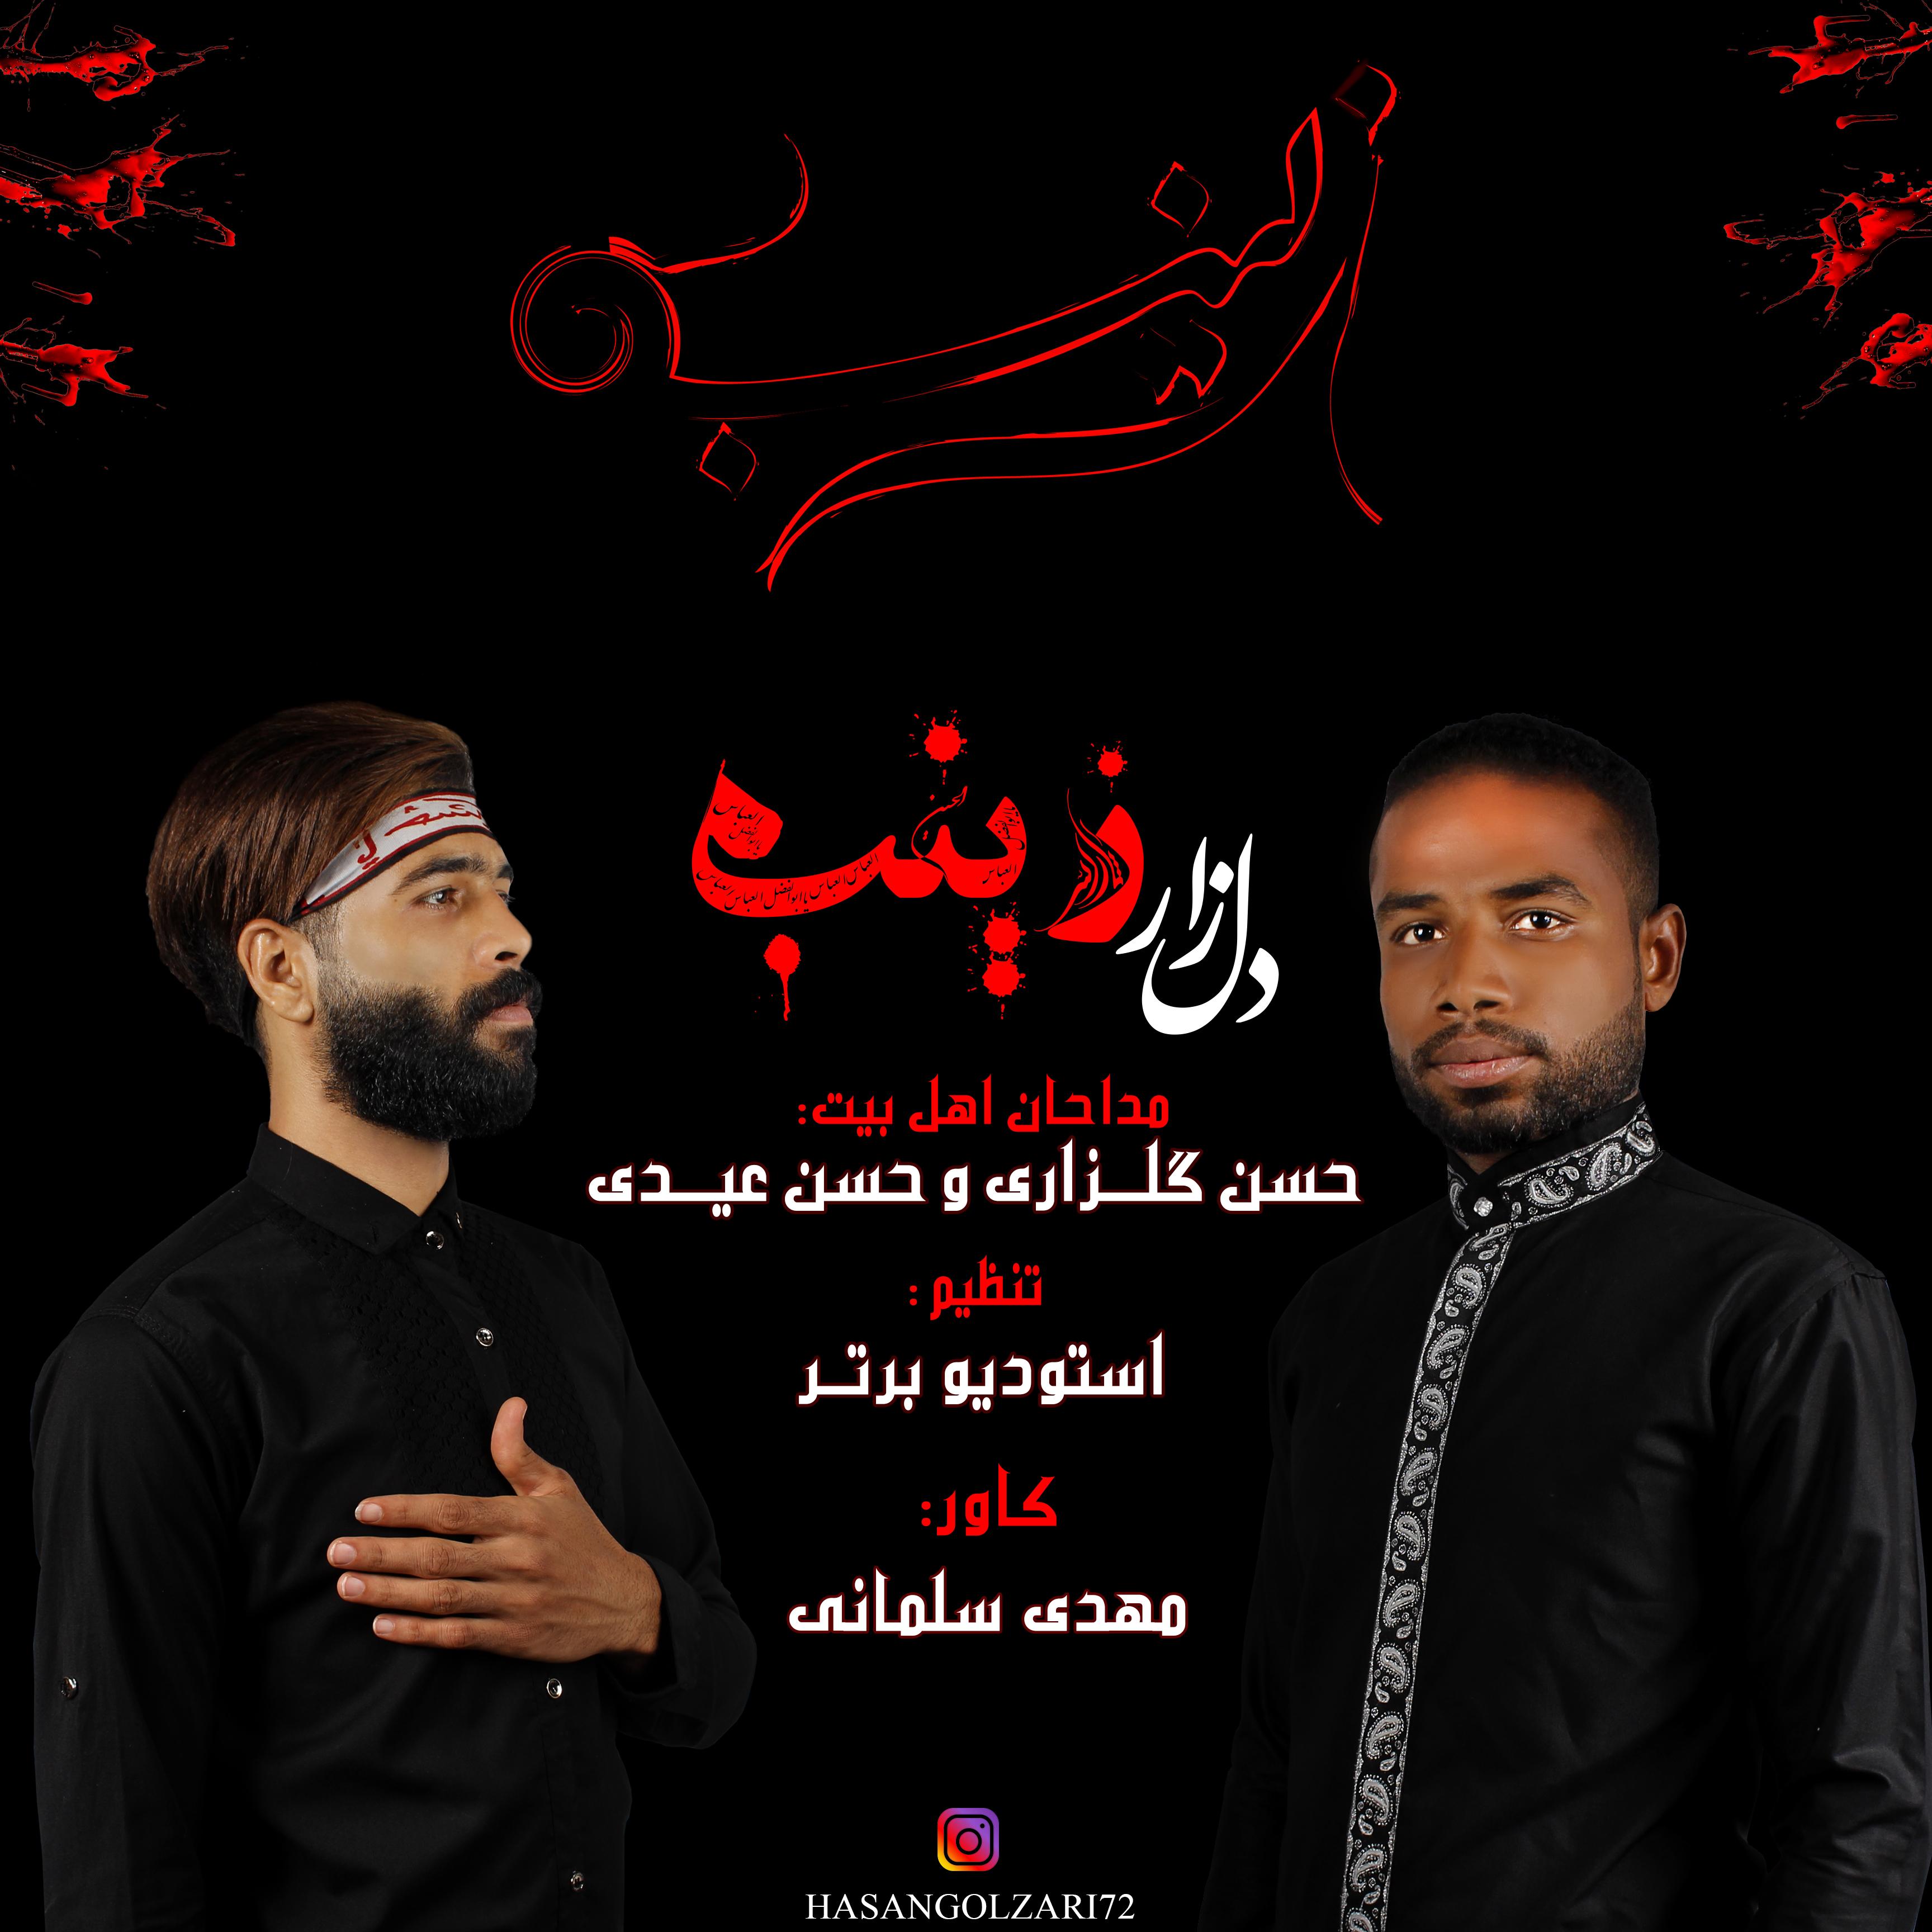 Hasan Golzari & Hasan Eydi – Dele Zare Zinab